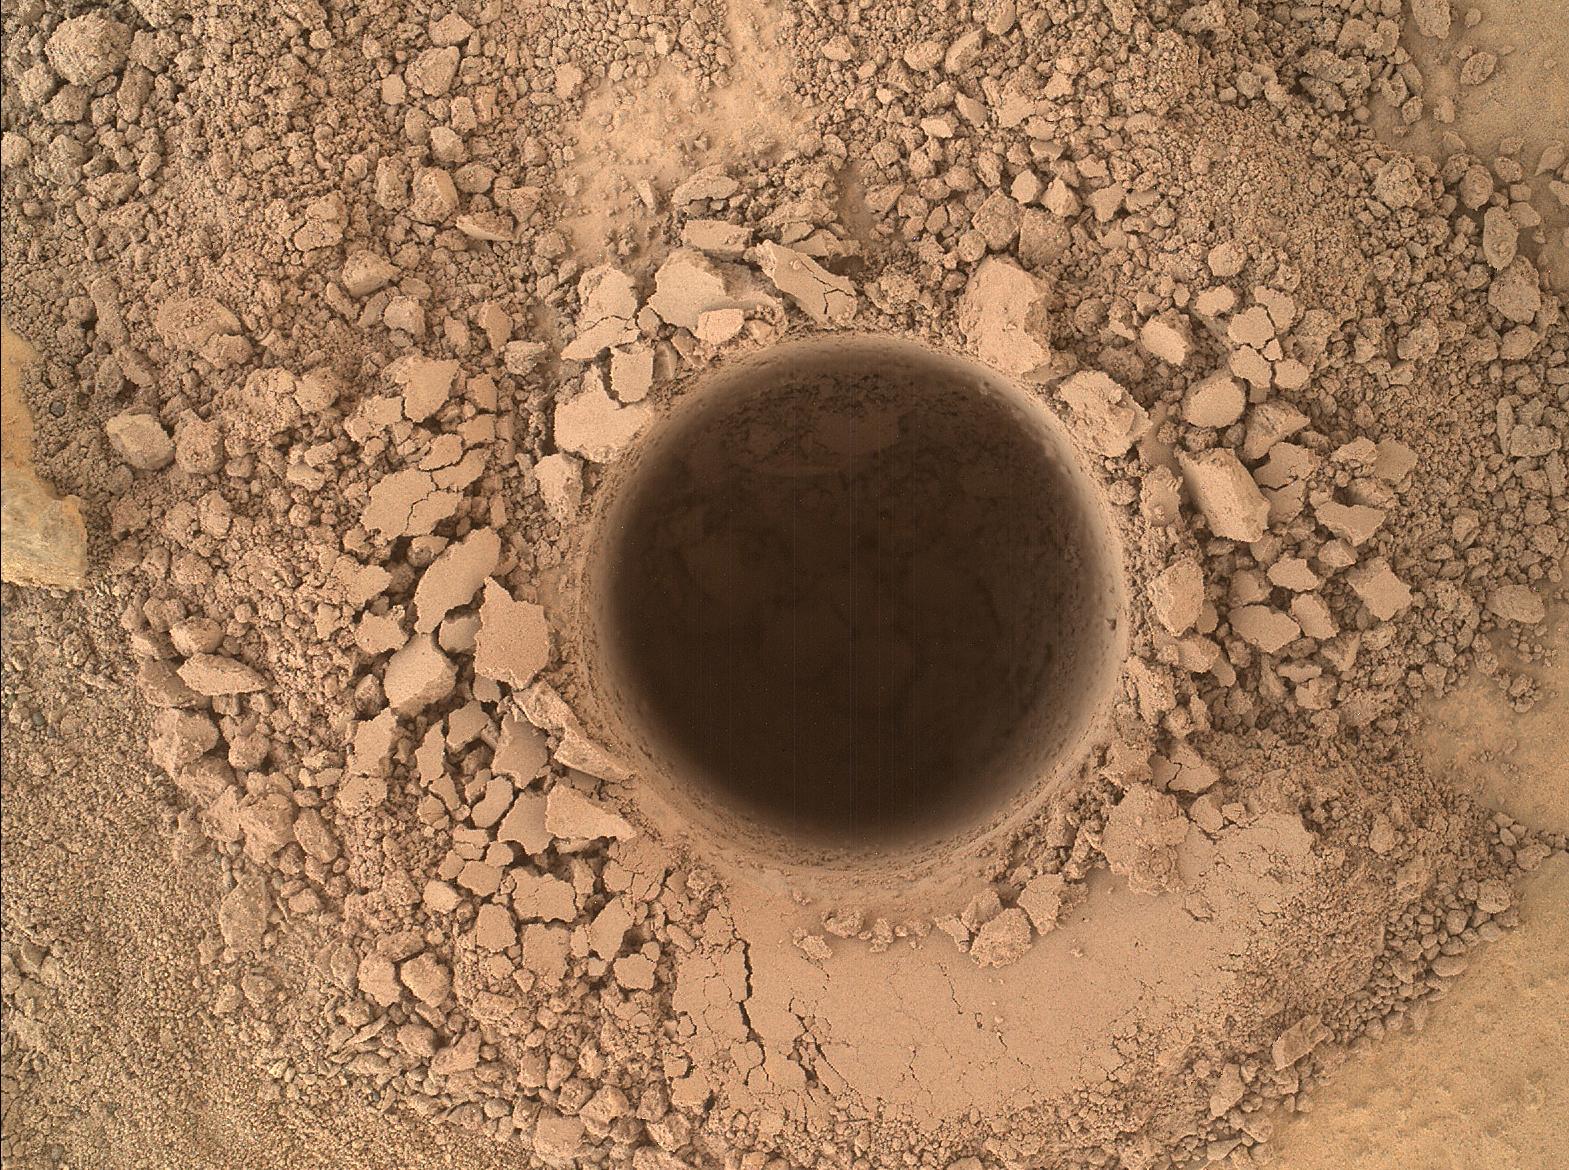 mars-curiosity-rover-drill-hole-mahli-sol759-pia18609-full